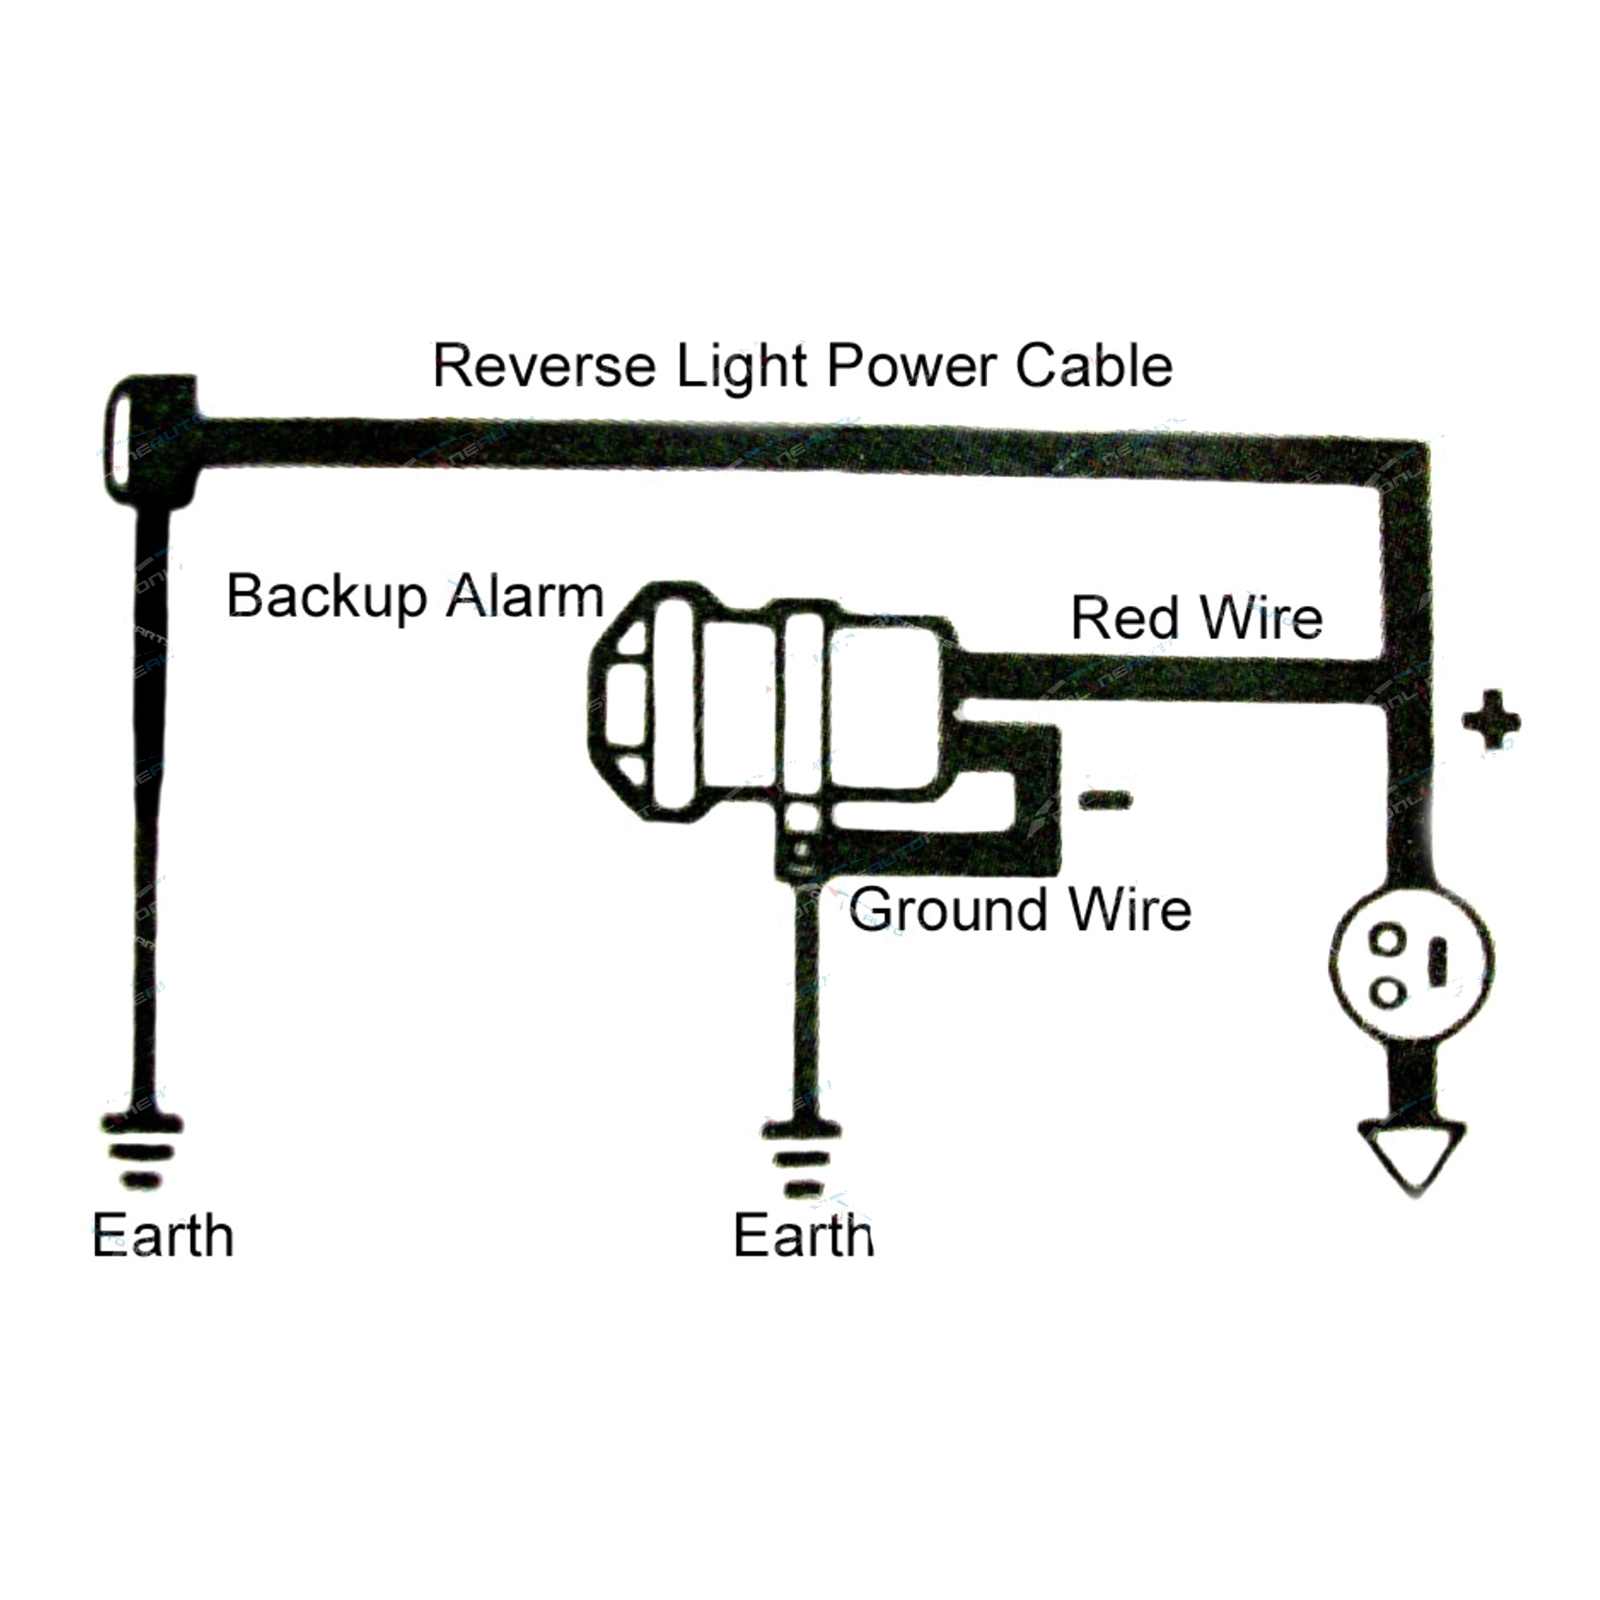 C Wiring Diagram Back Up Alarm